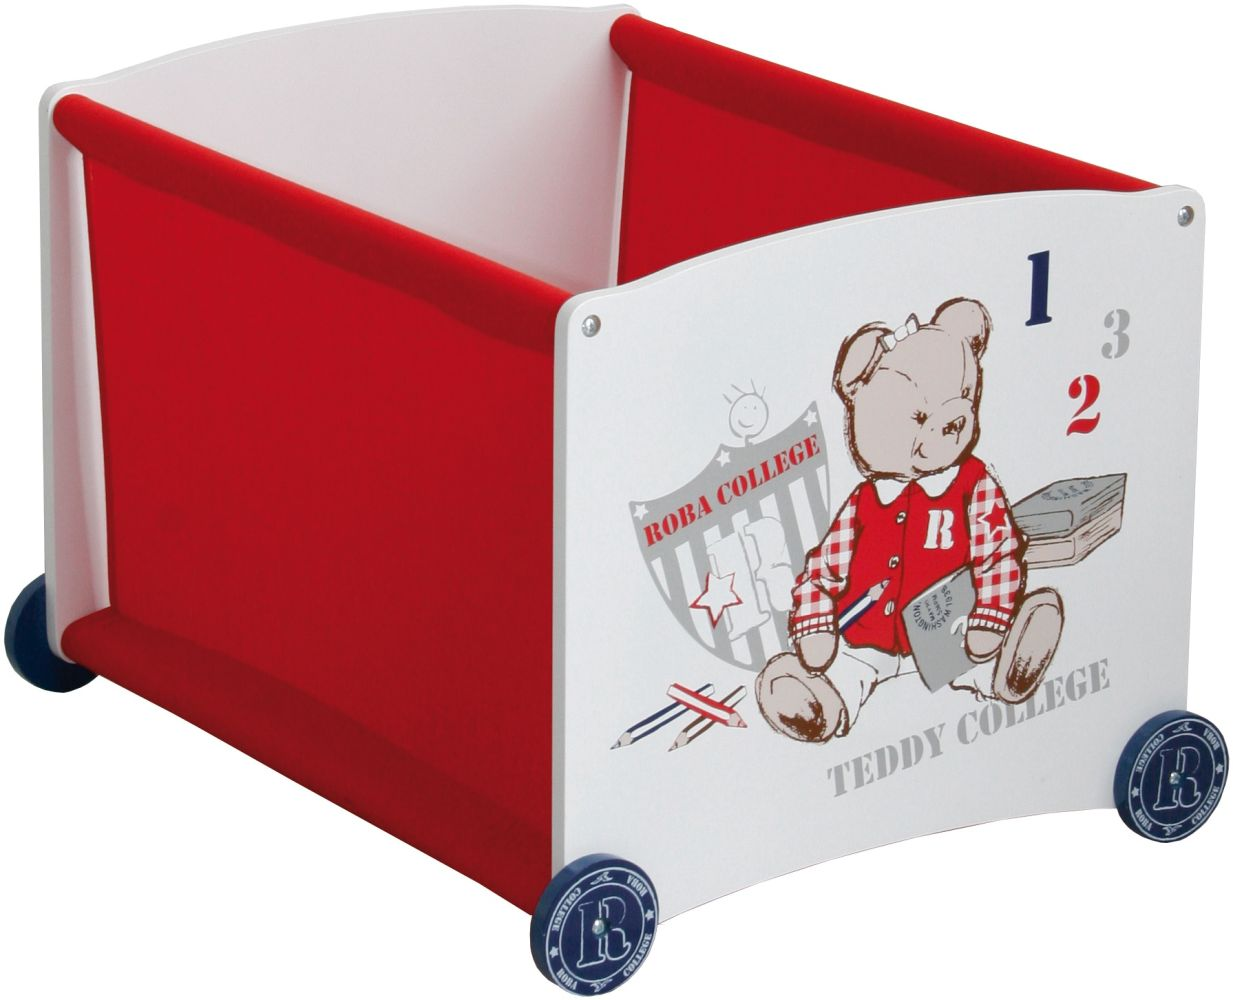 Roba 'Teddy College' Stapelbox Bild 1